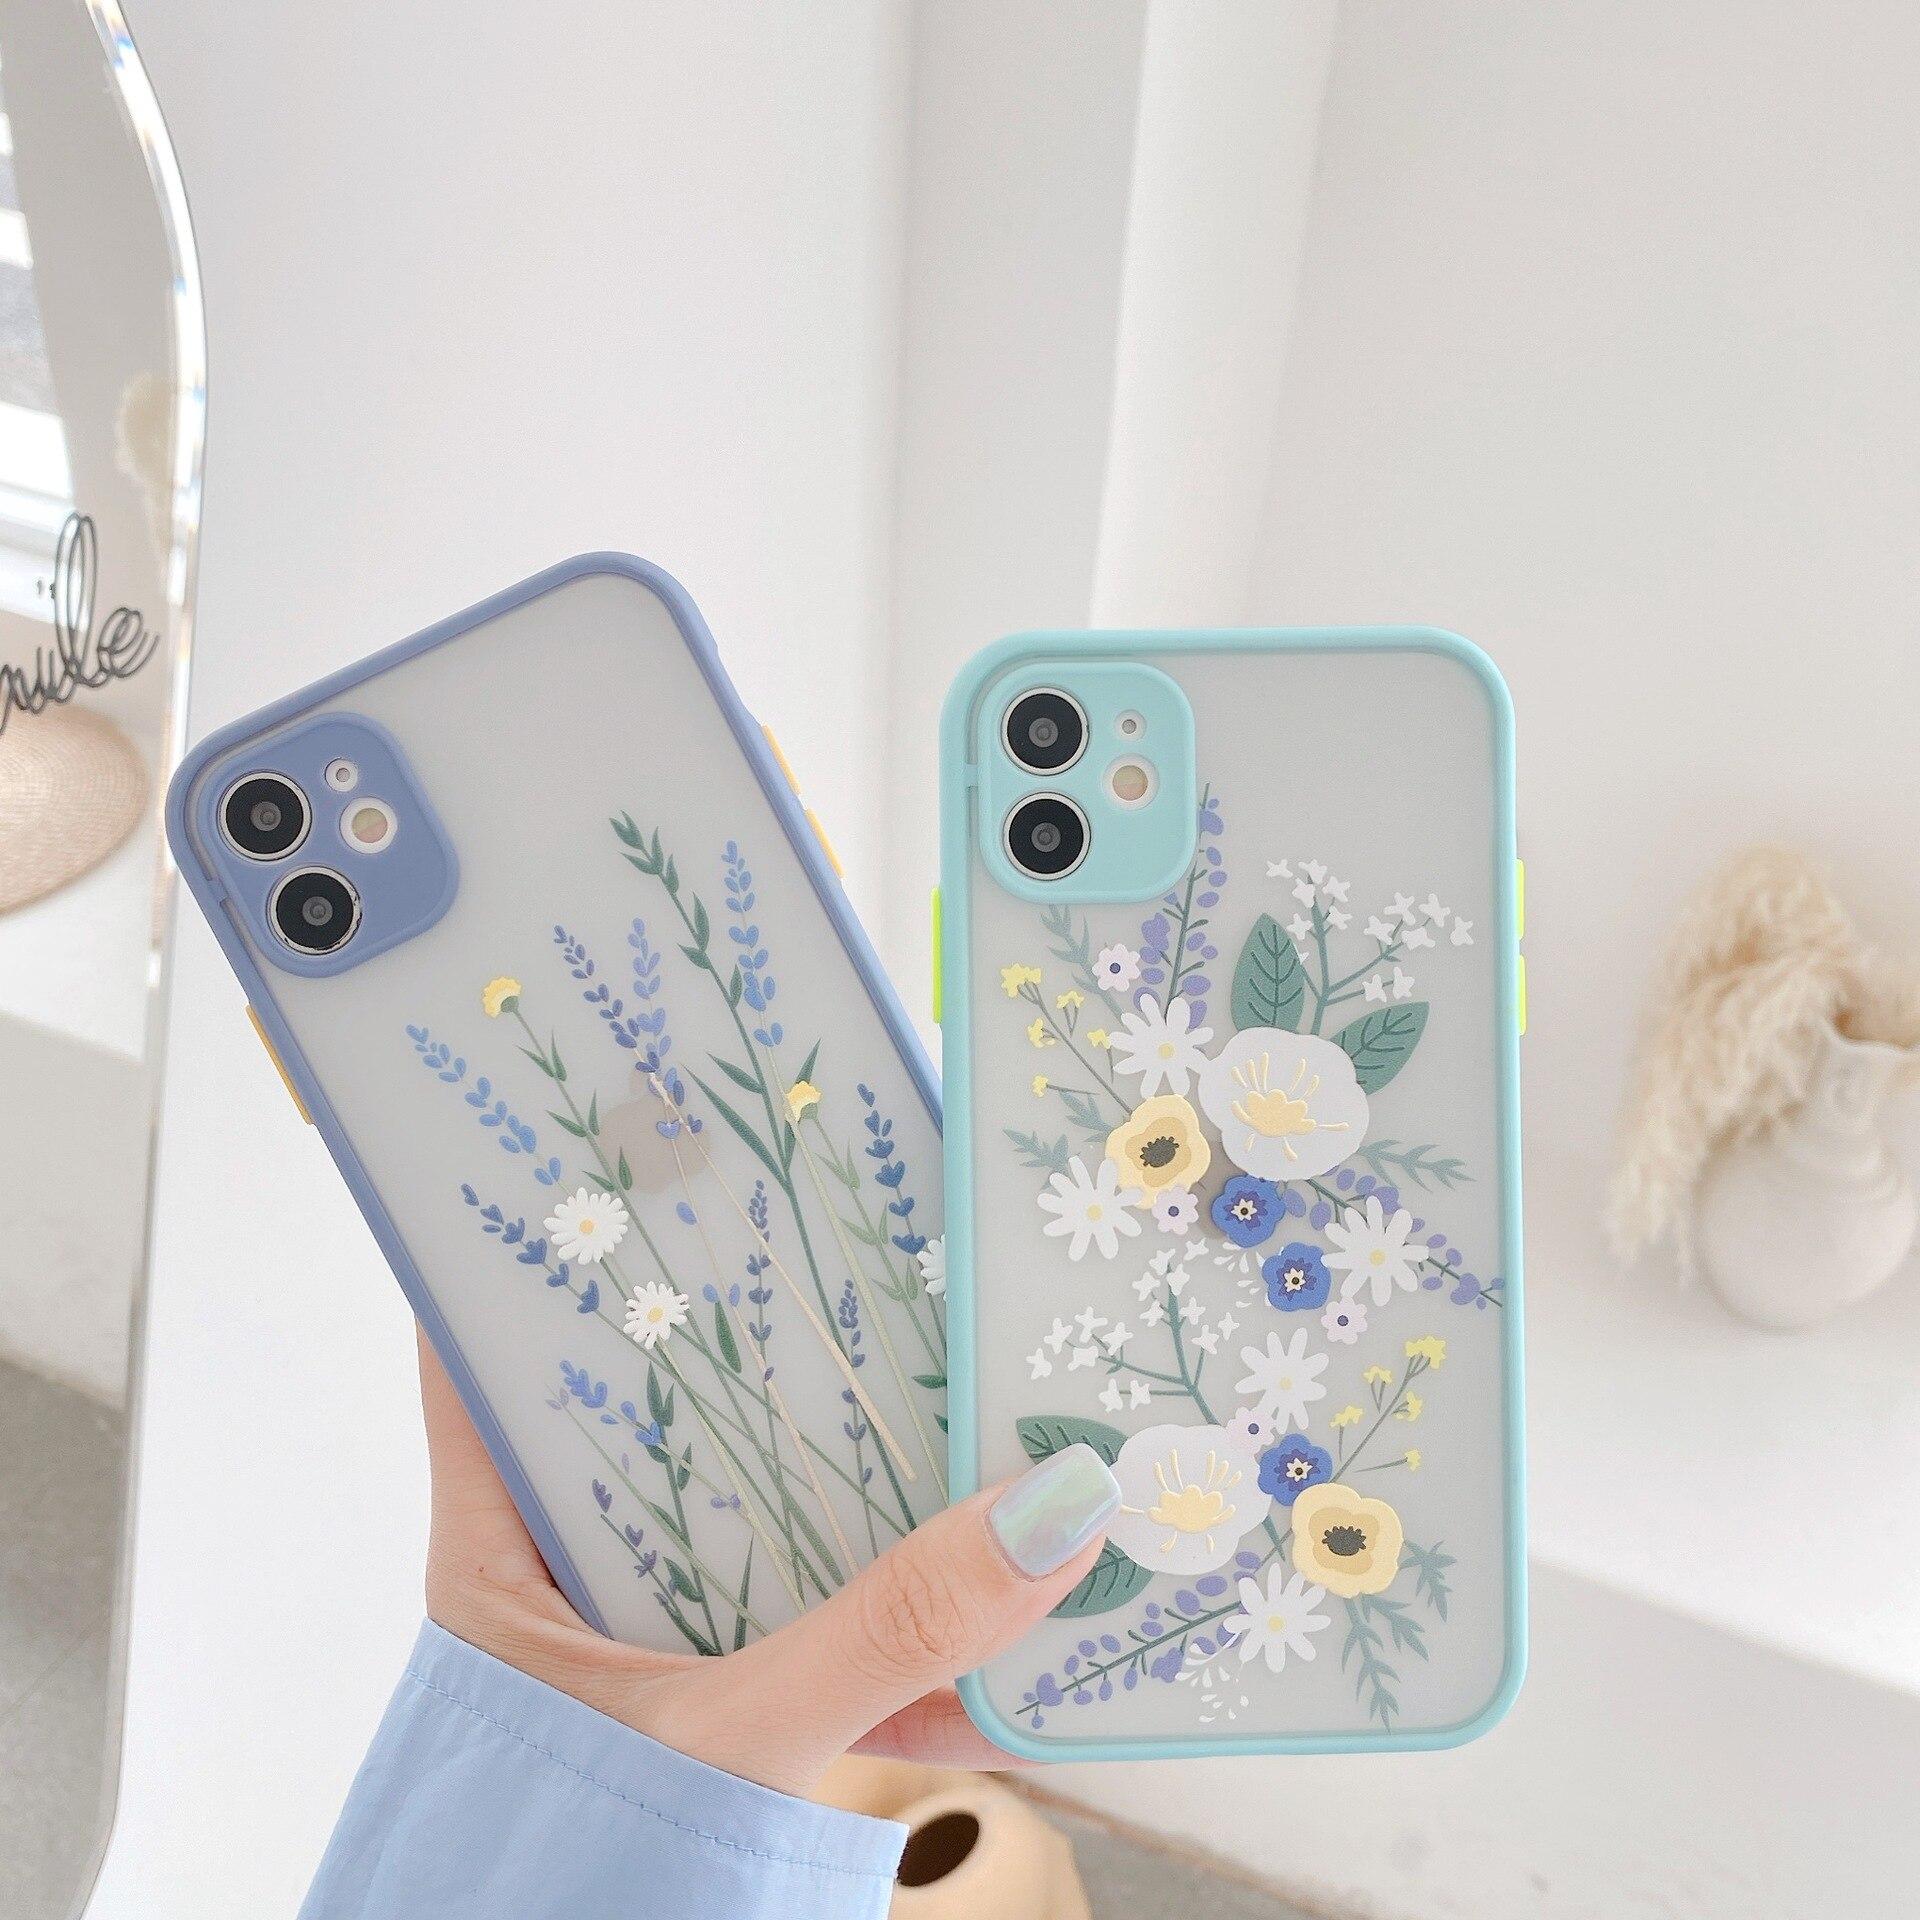 Funda de lujo de flores para iPhone 11 Pro Max X XR XS Max 7 8 Plus, funda trasera de TPU suave transparente con relieve Floral 3D